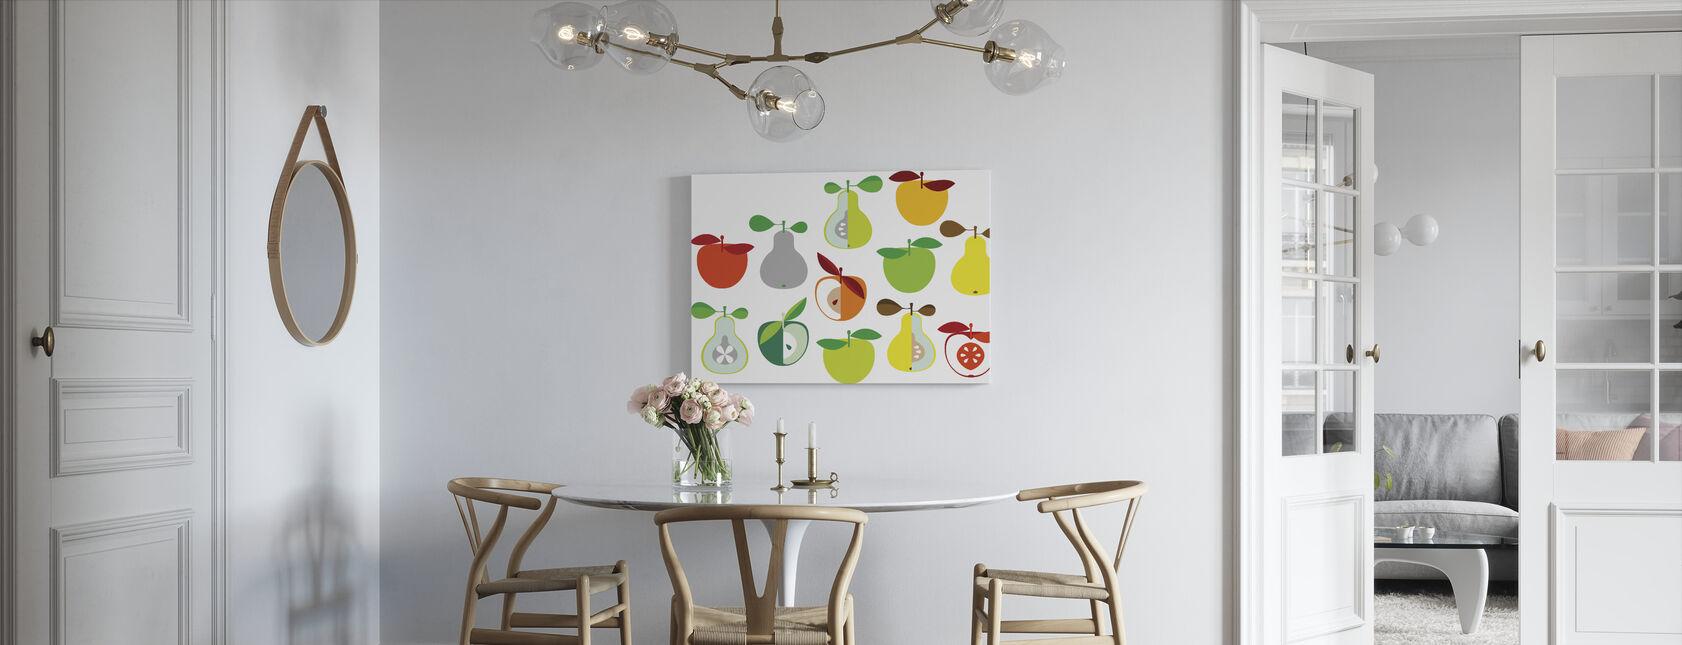 Kivik Äpple och päron - Vit - Canvastavla - Kök